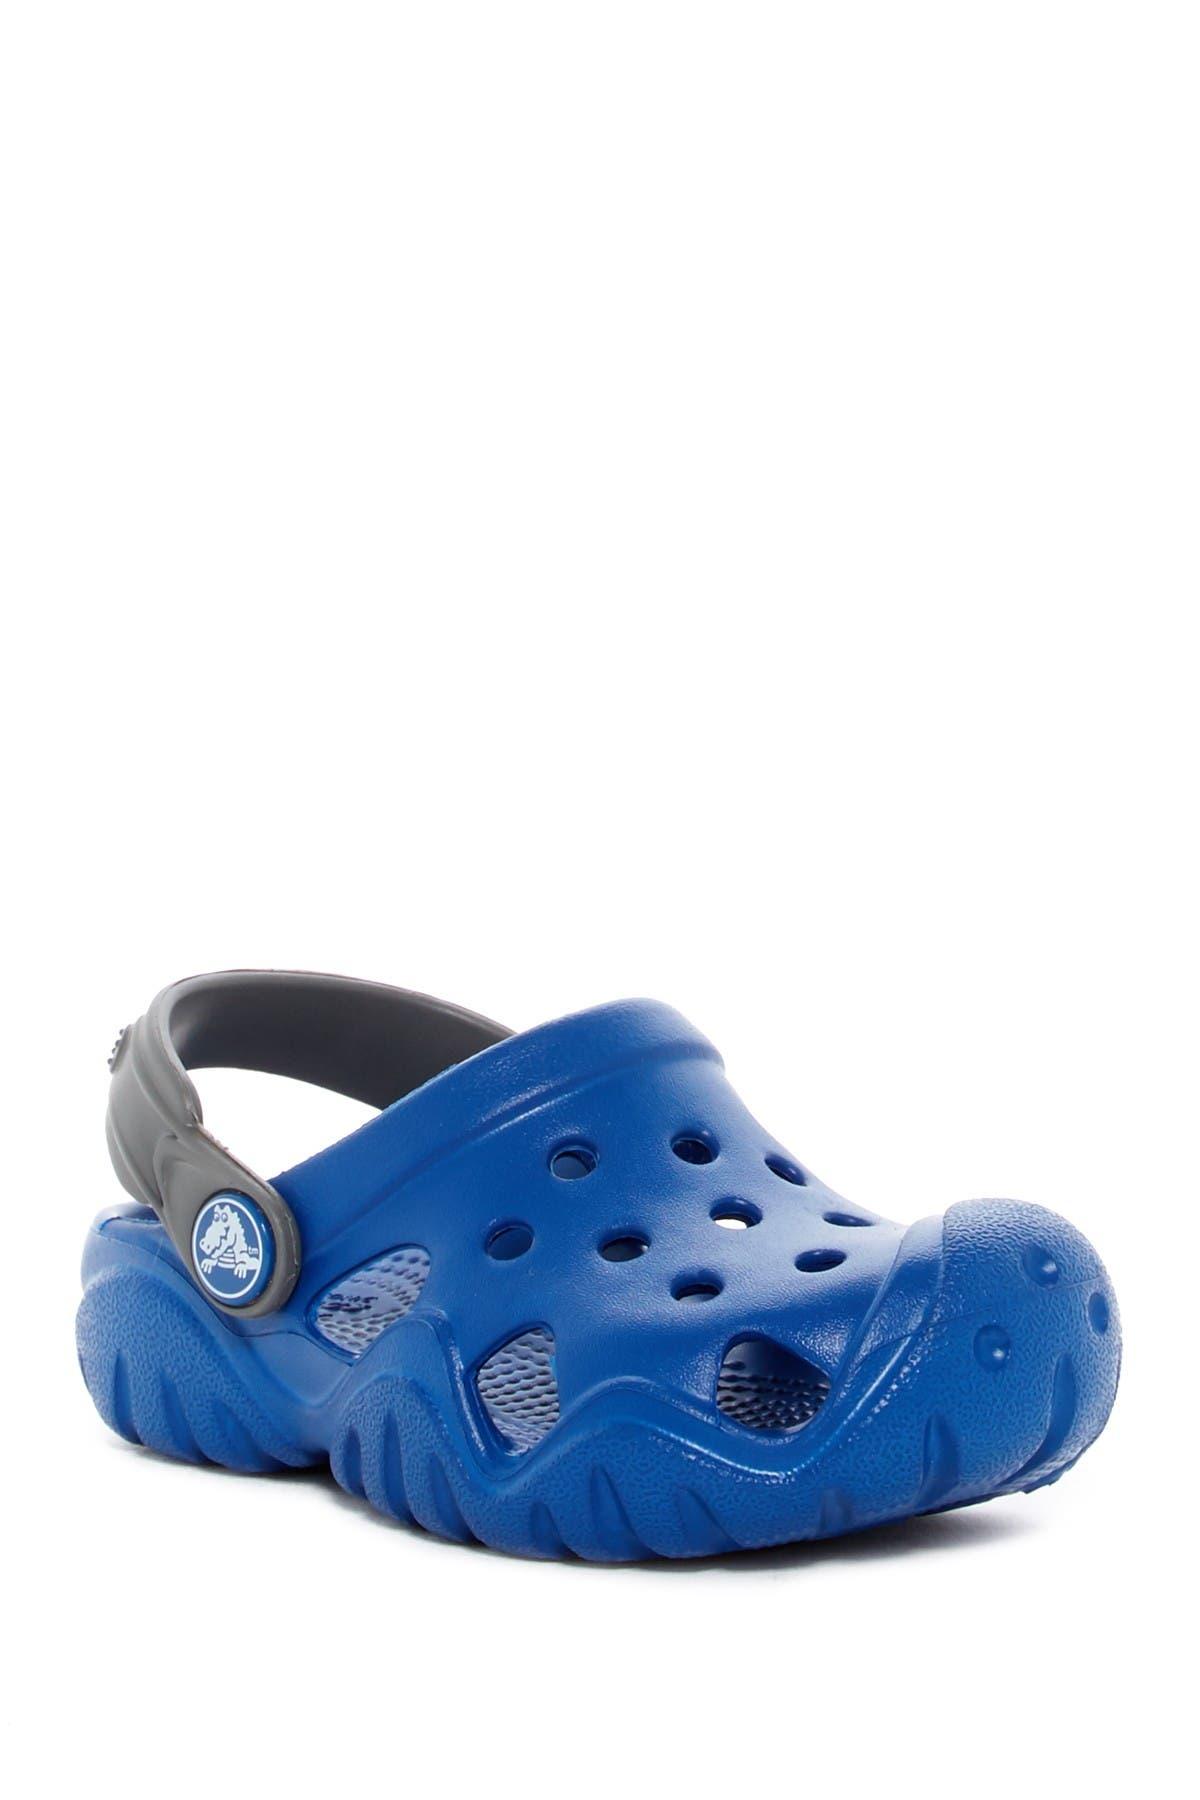 Crocs   Swiftwater Clogs   Nordstrom Rack